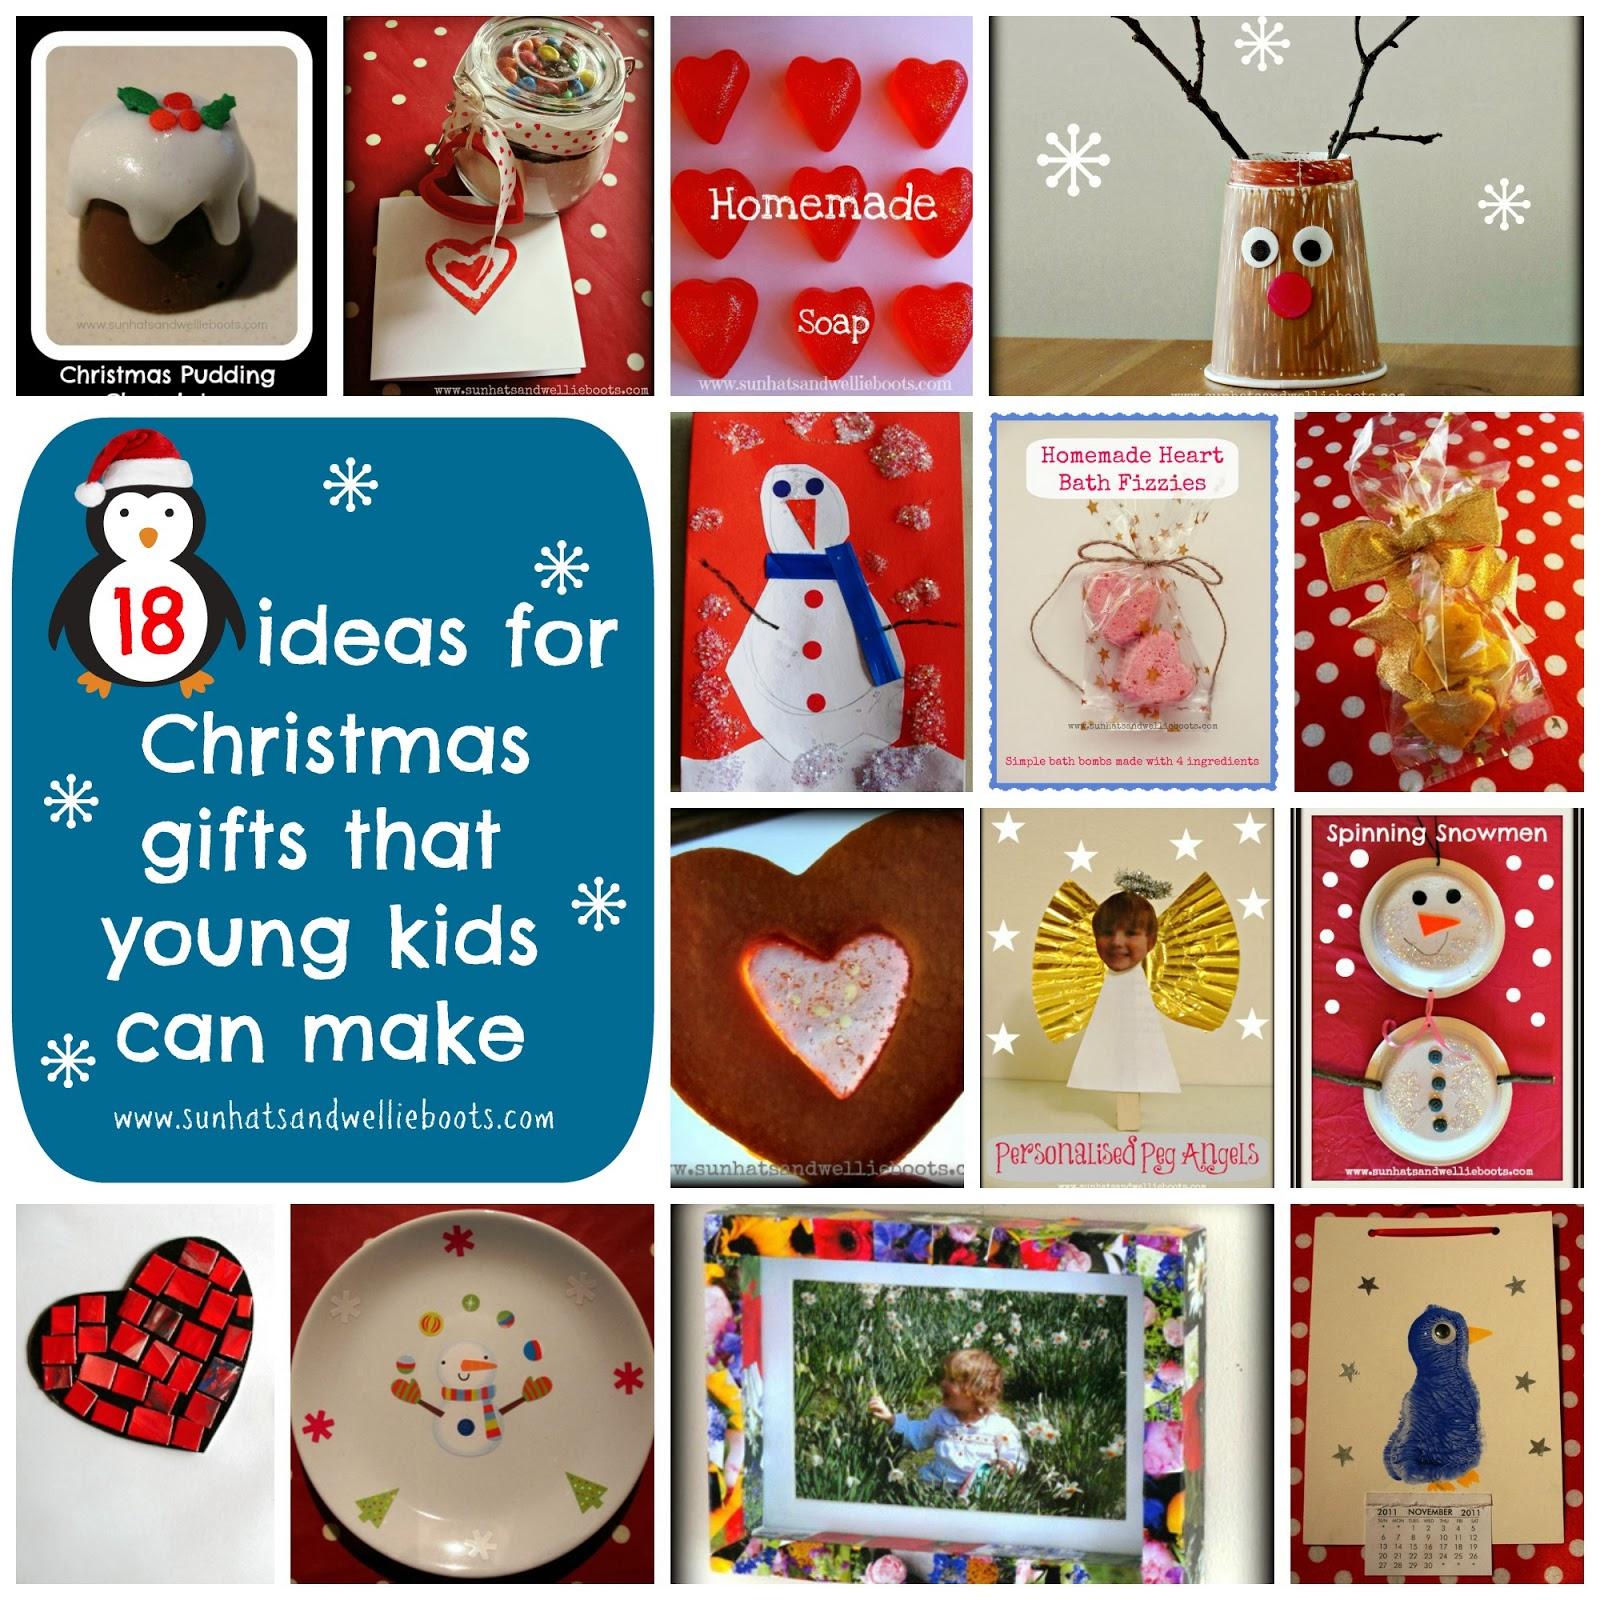 Christmas Homemade Gifts For Family Wztbut Allchristmas Site